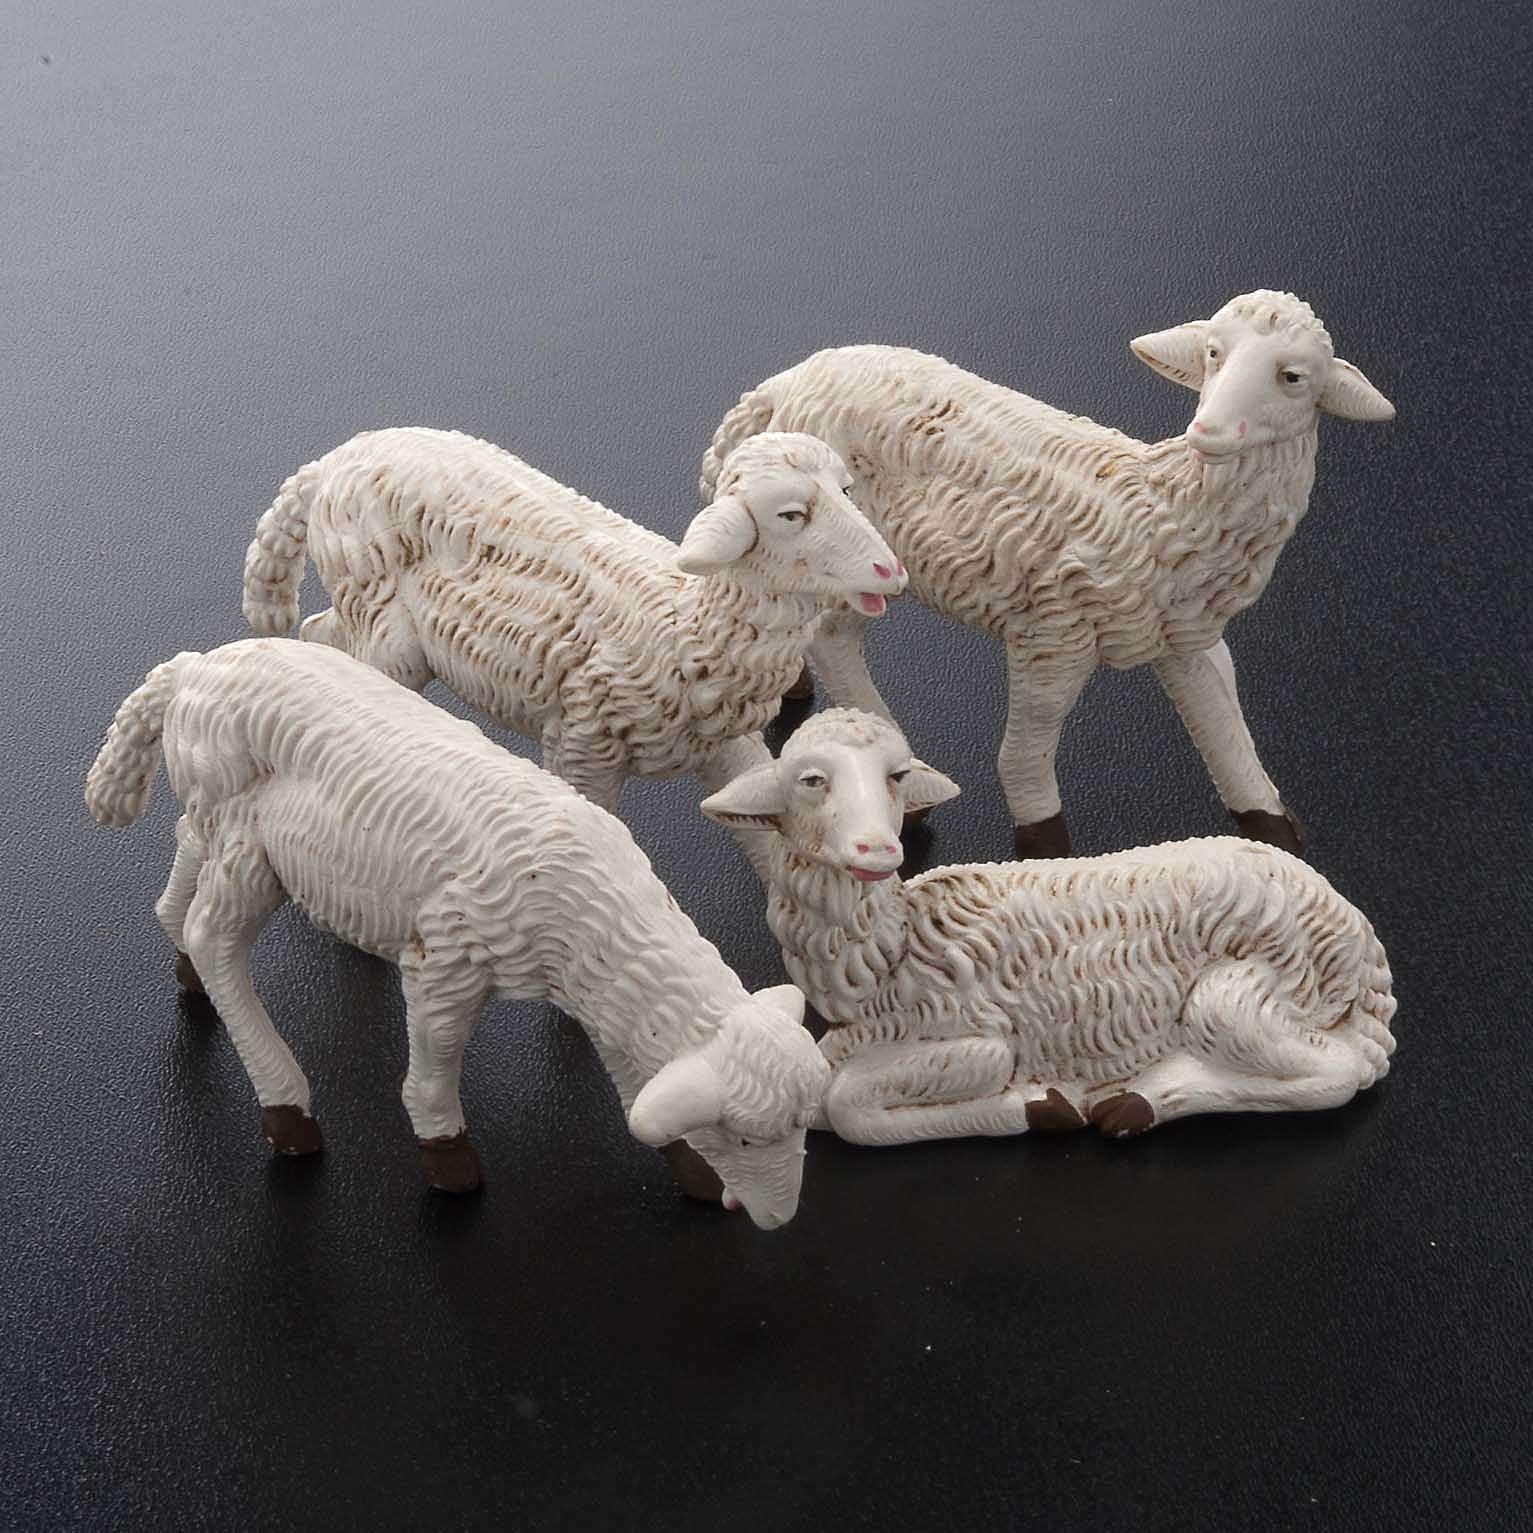 Nativity scene figurines, plastic sheep, 4 pieces 16cm 3